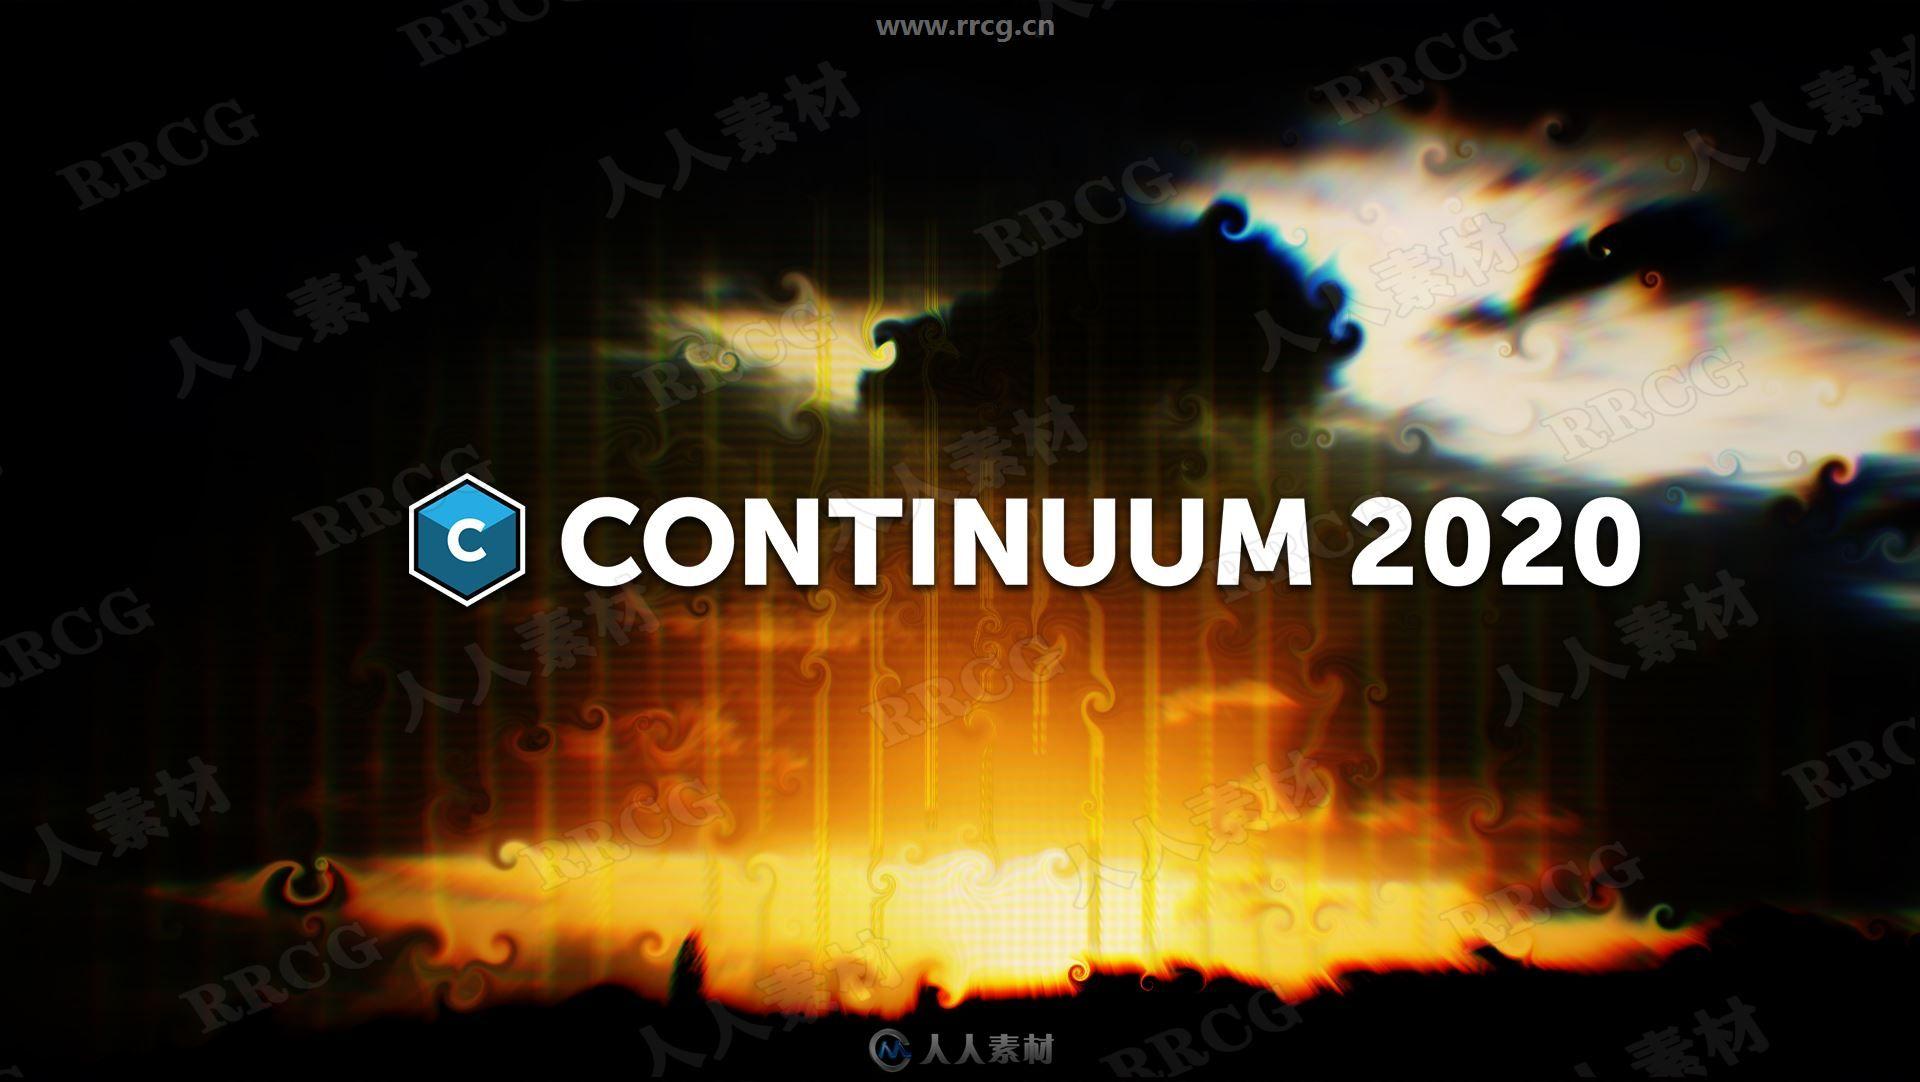 Boris FX Continuum 2020超强特效插件V13.5.0.1182版